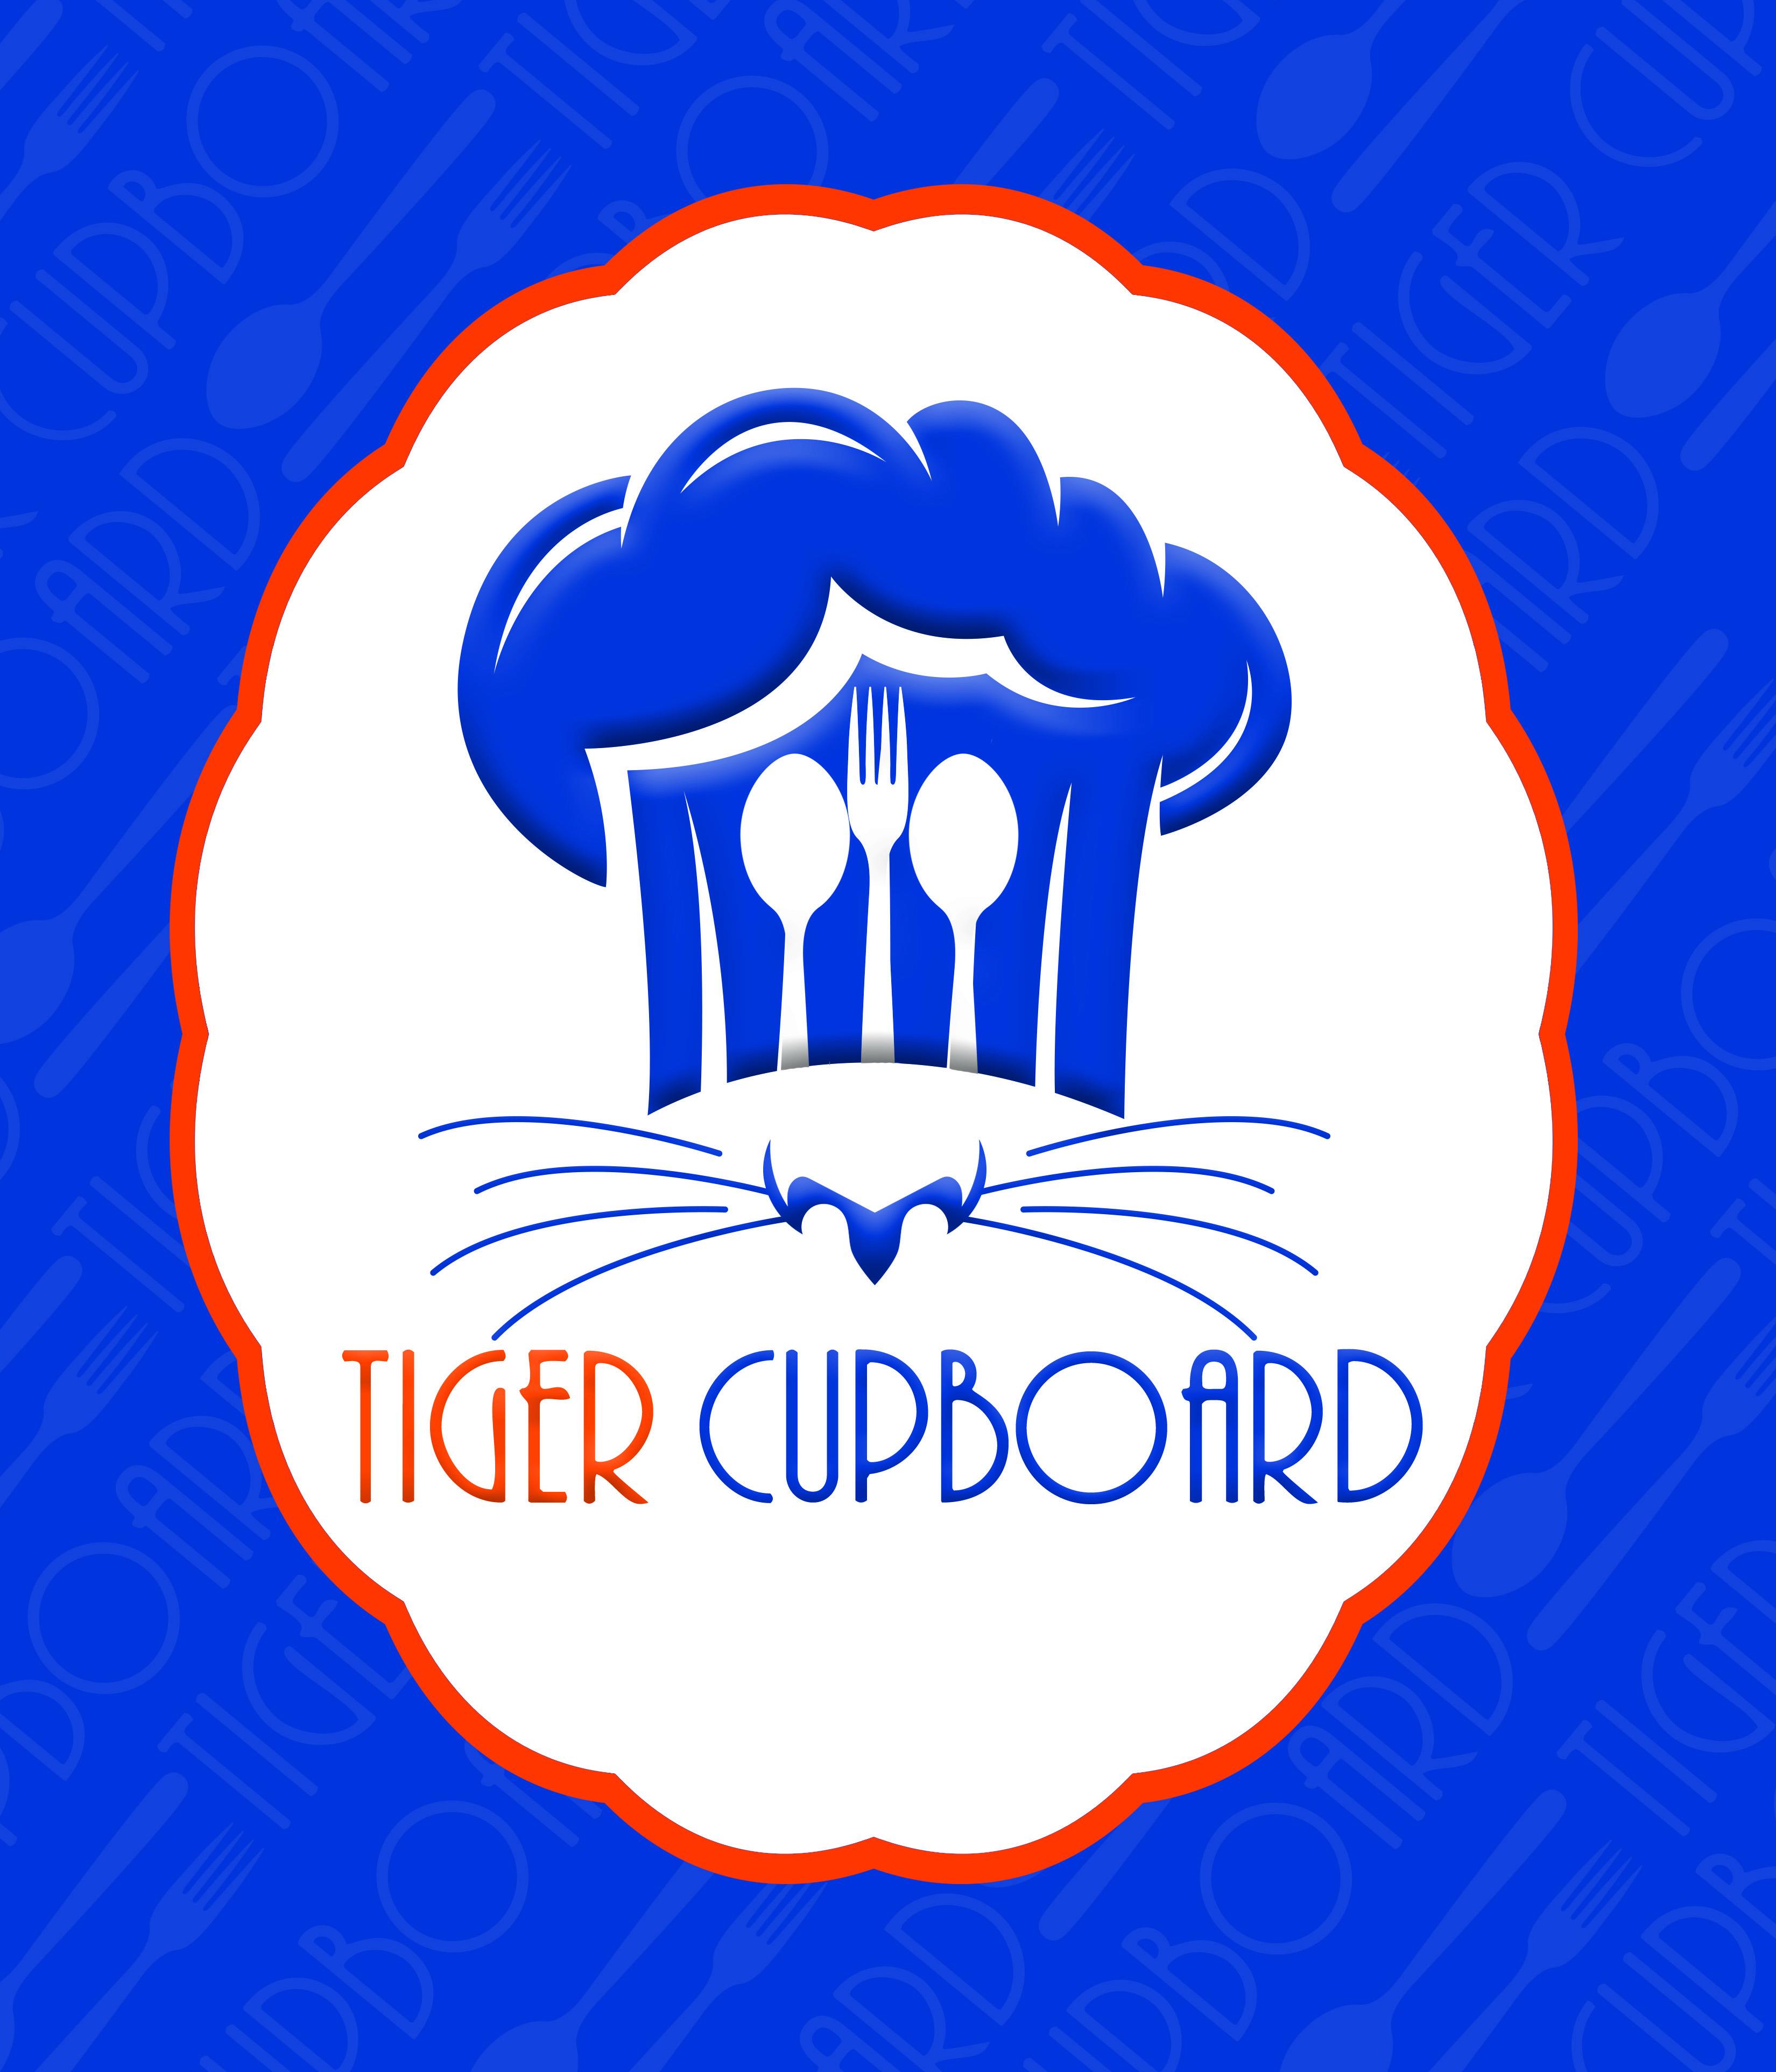 tiger cupboard